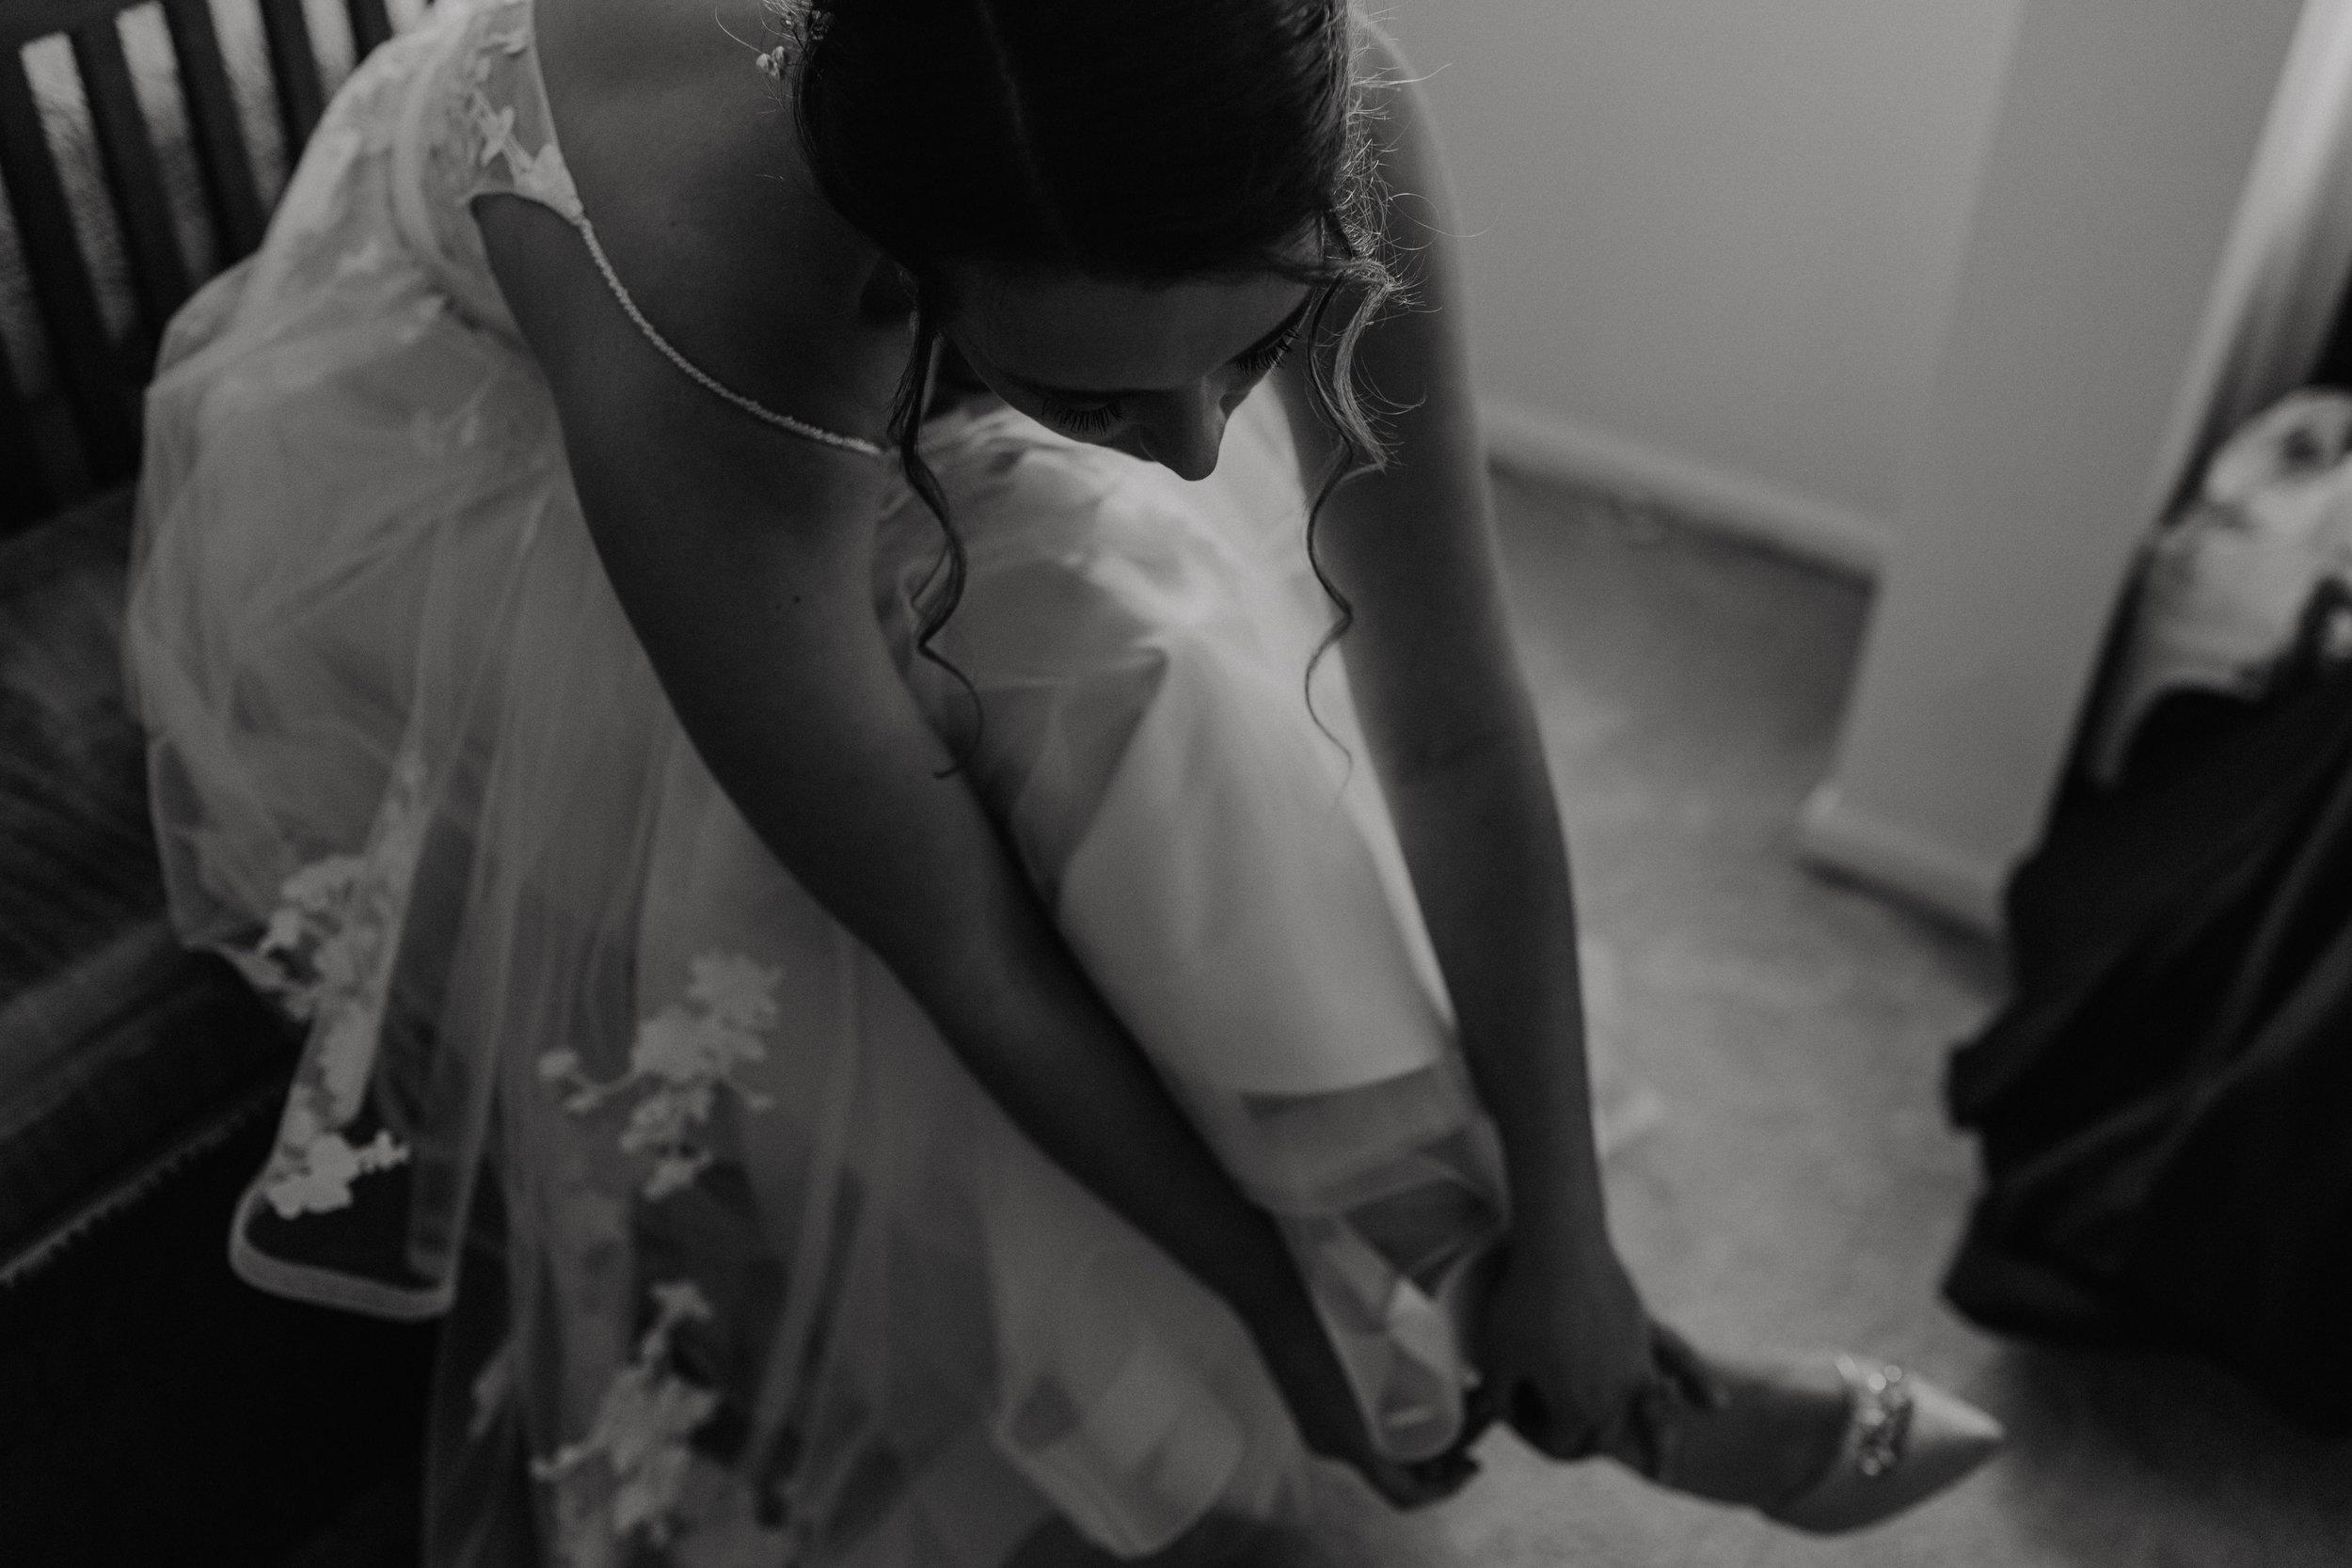 upstate_ny_wedding-17.jpg